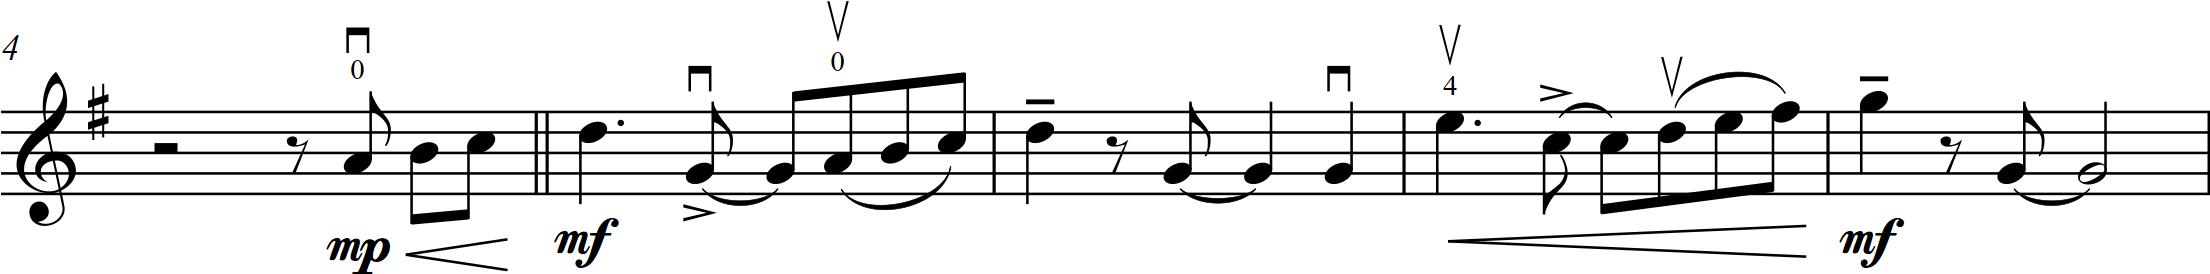 G2 Petzold (Cornick) - Menuet - 4-8 vln